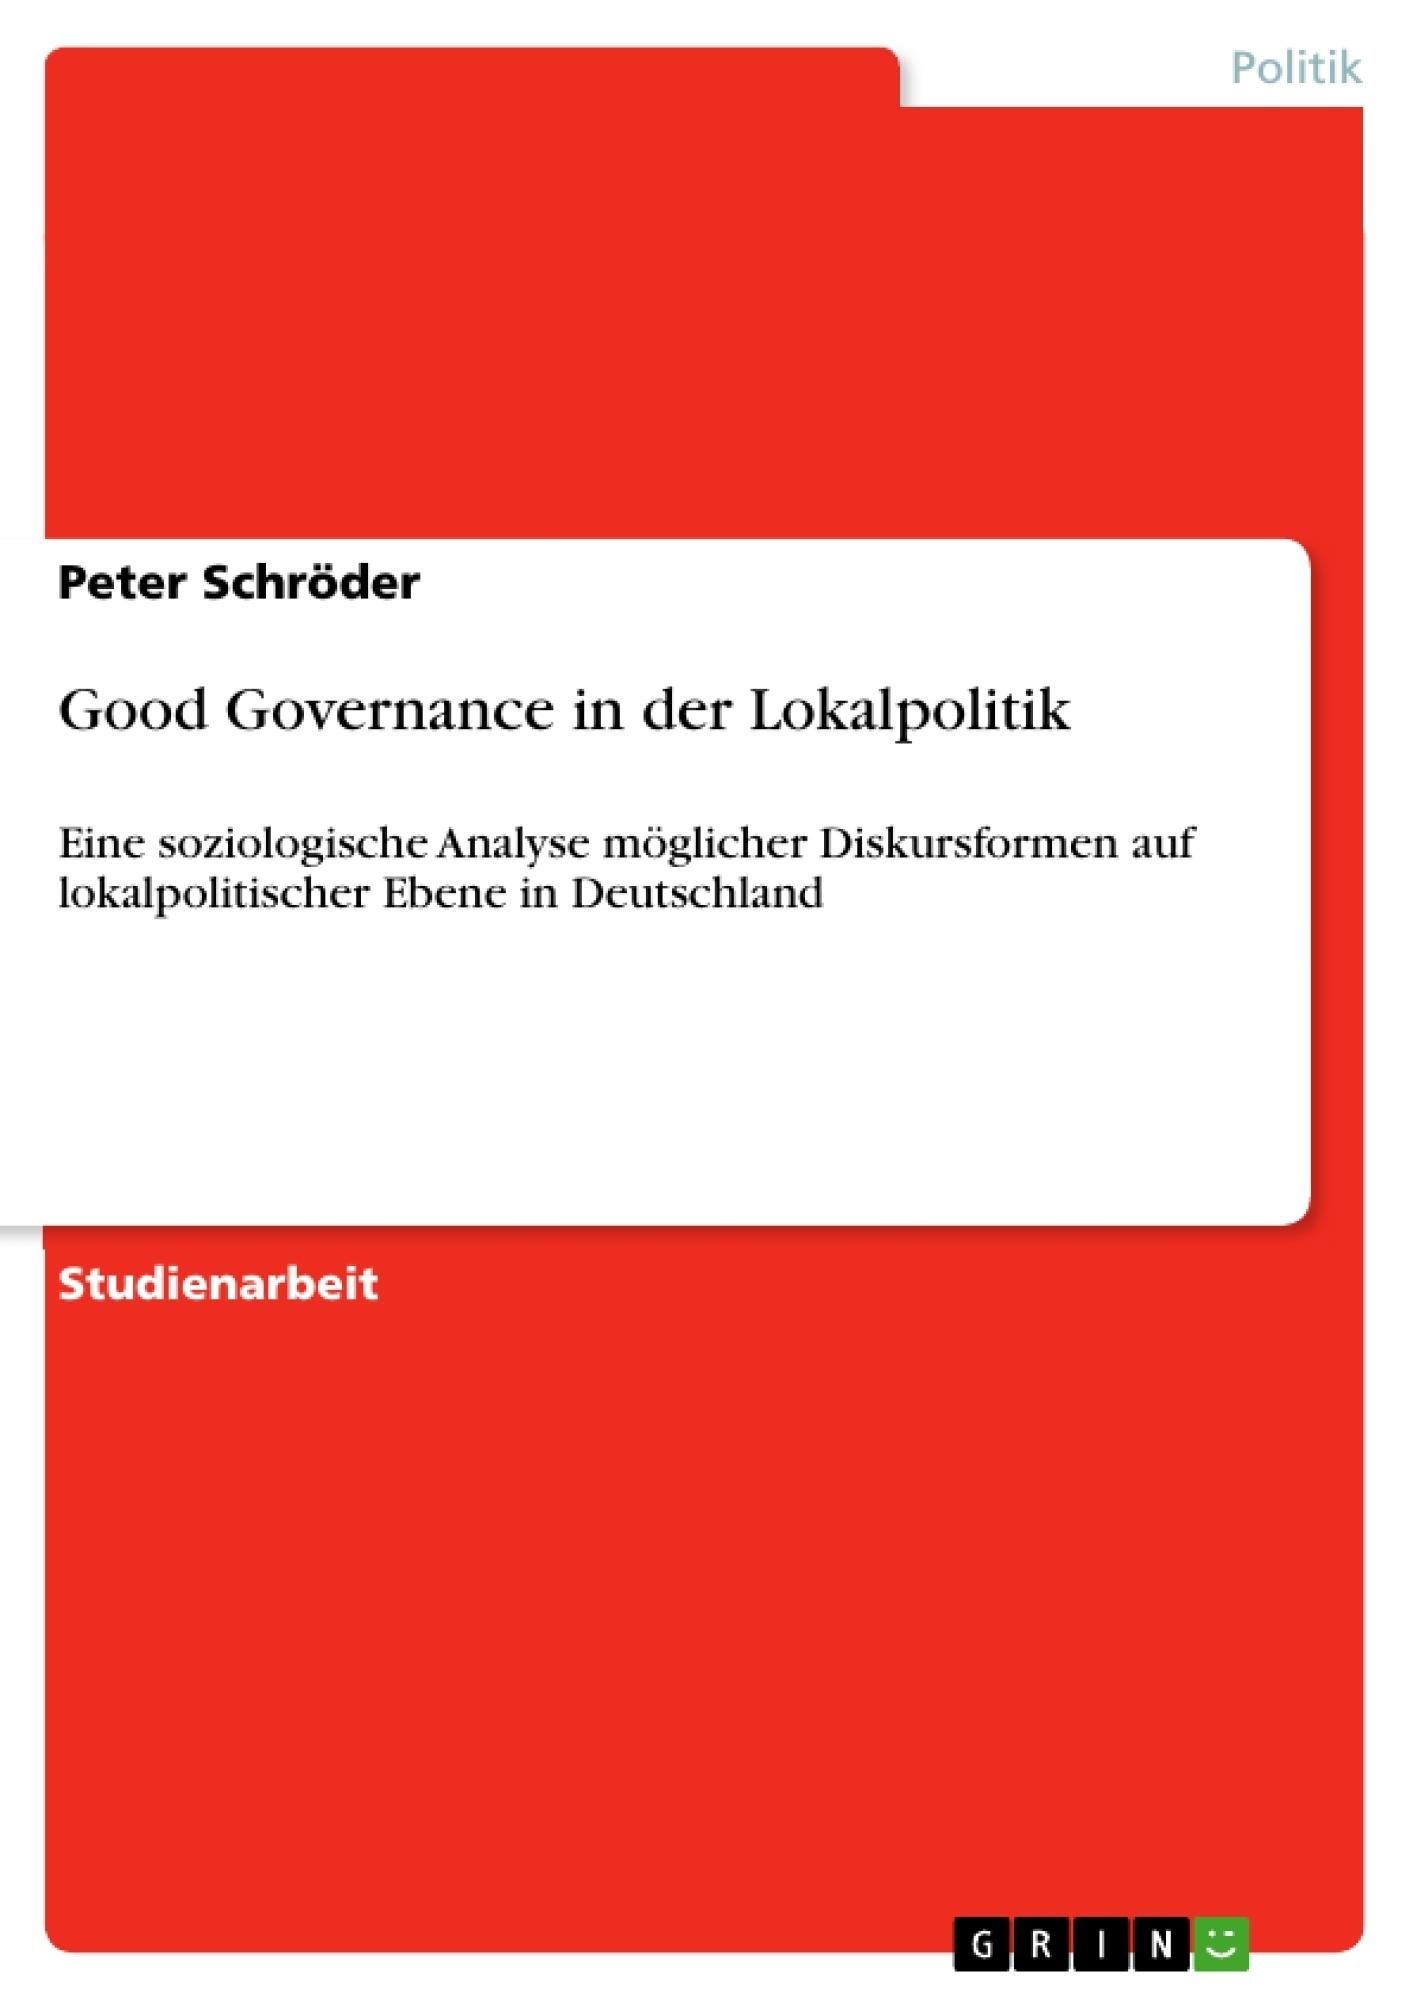 Titel: Good Governance in der Lokalpolitik